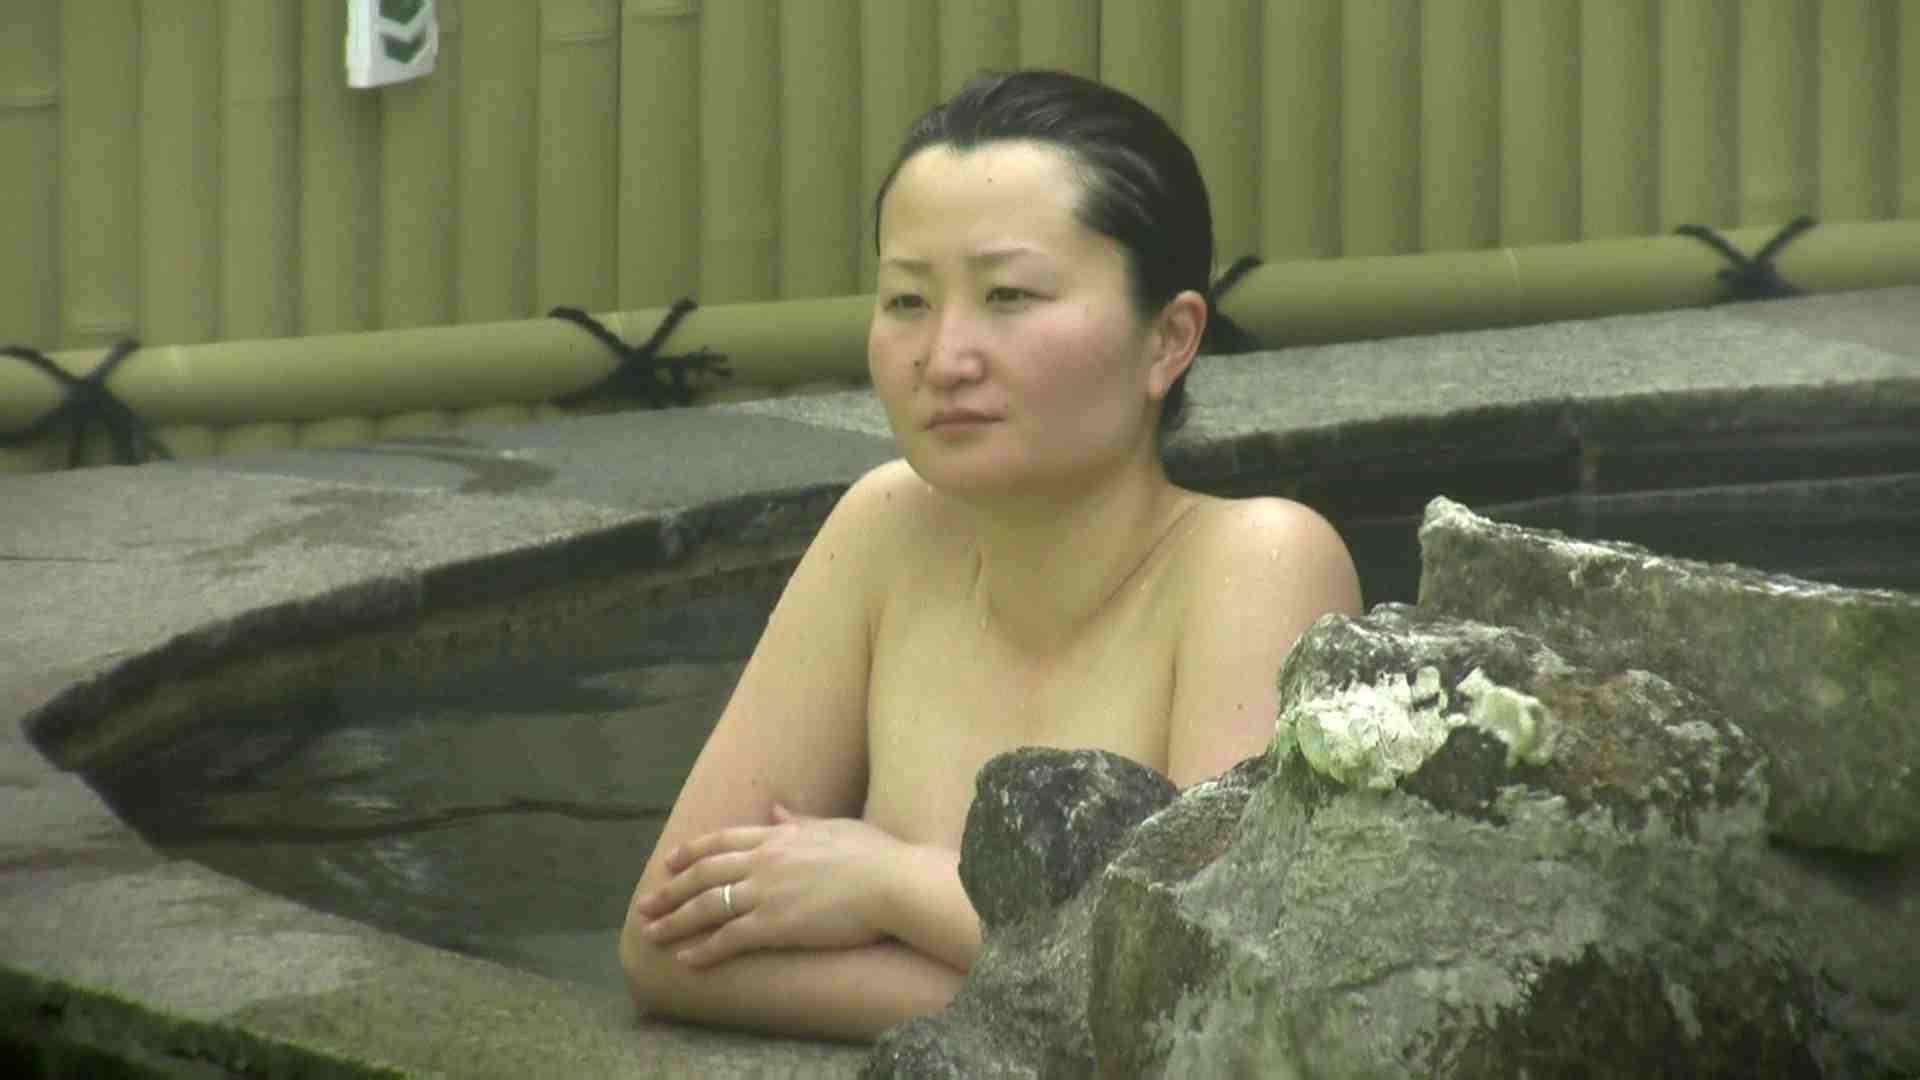 Aquaな露天風呂Vol.632 盗撮シリーズ | 露天風呂編  100PIX 5